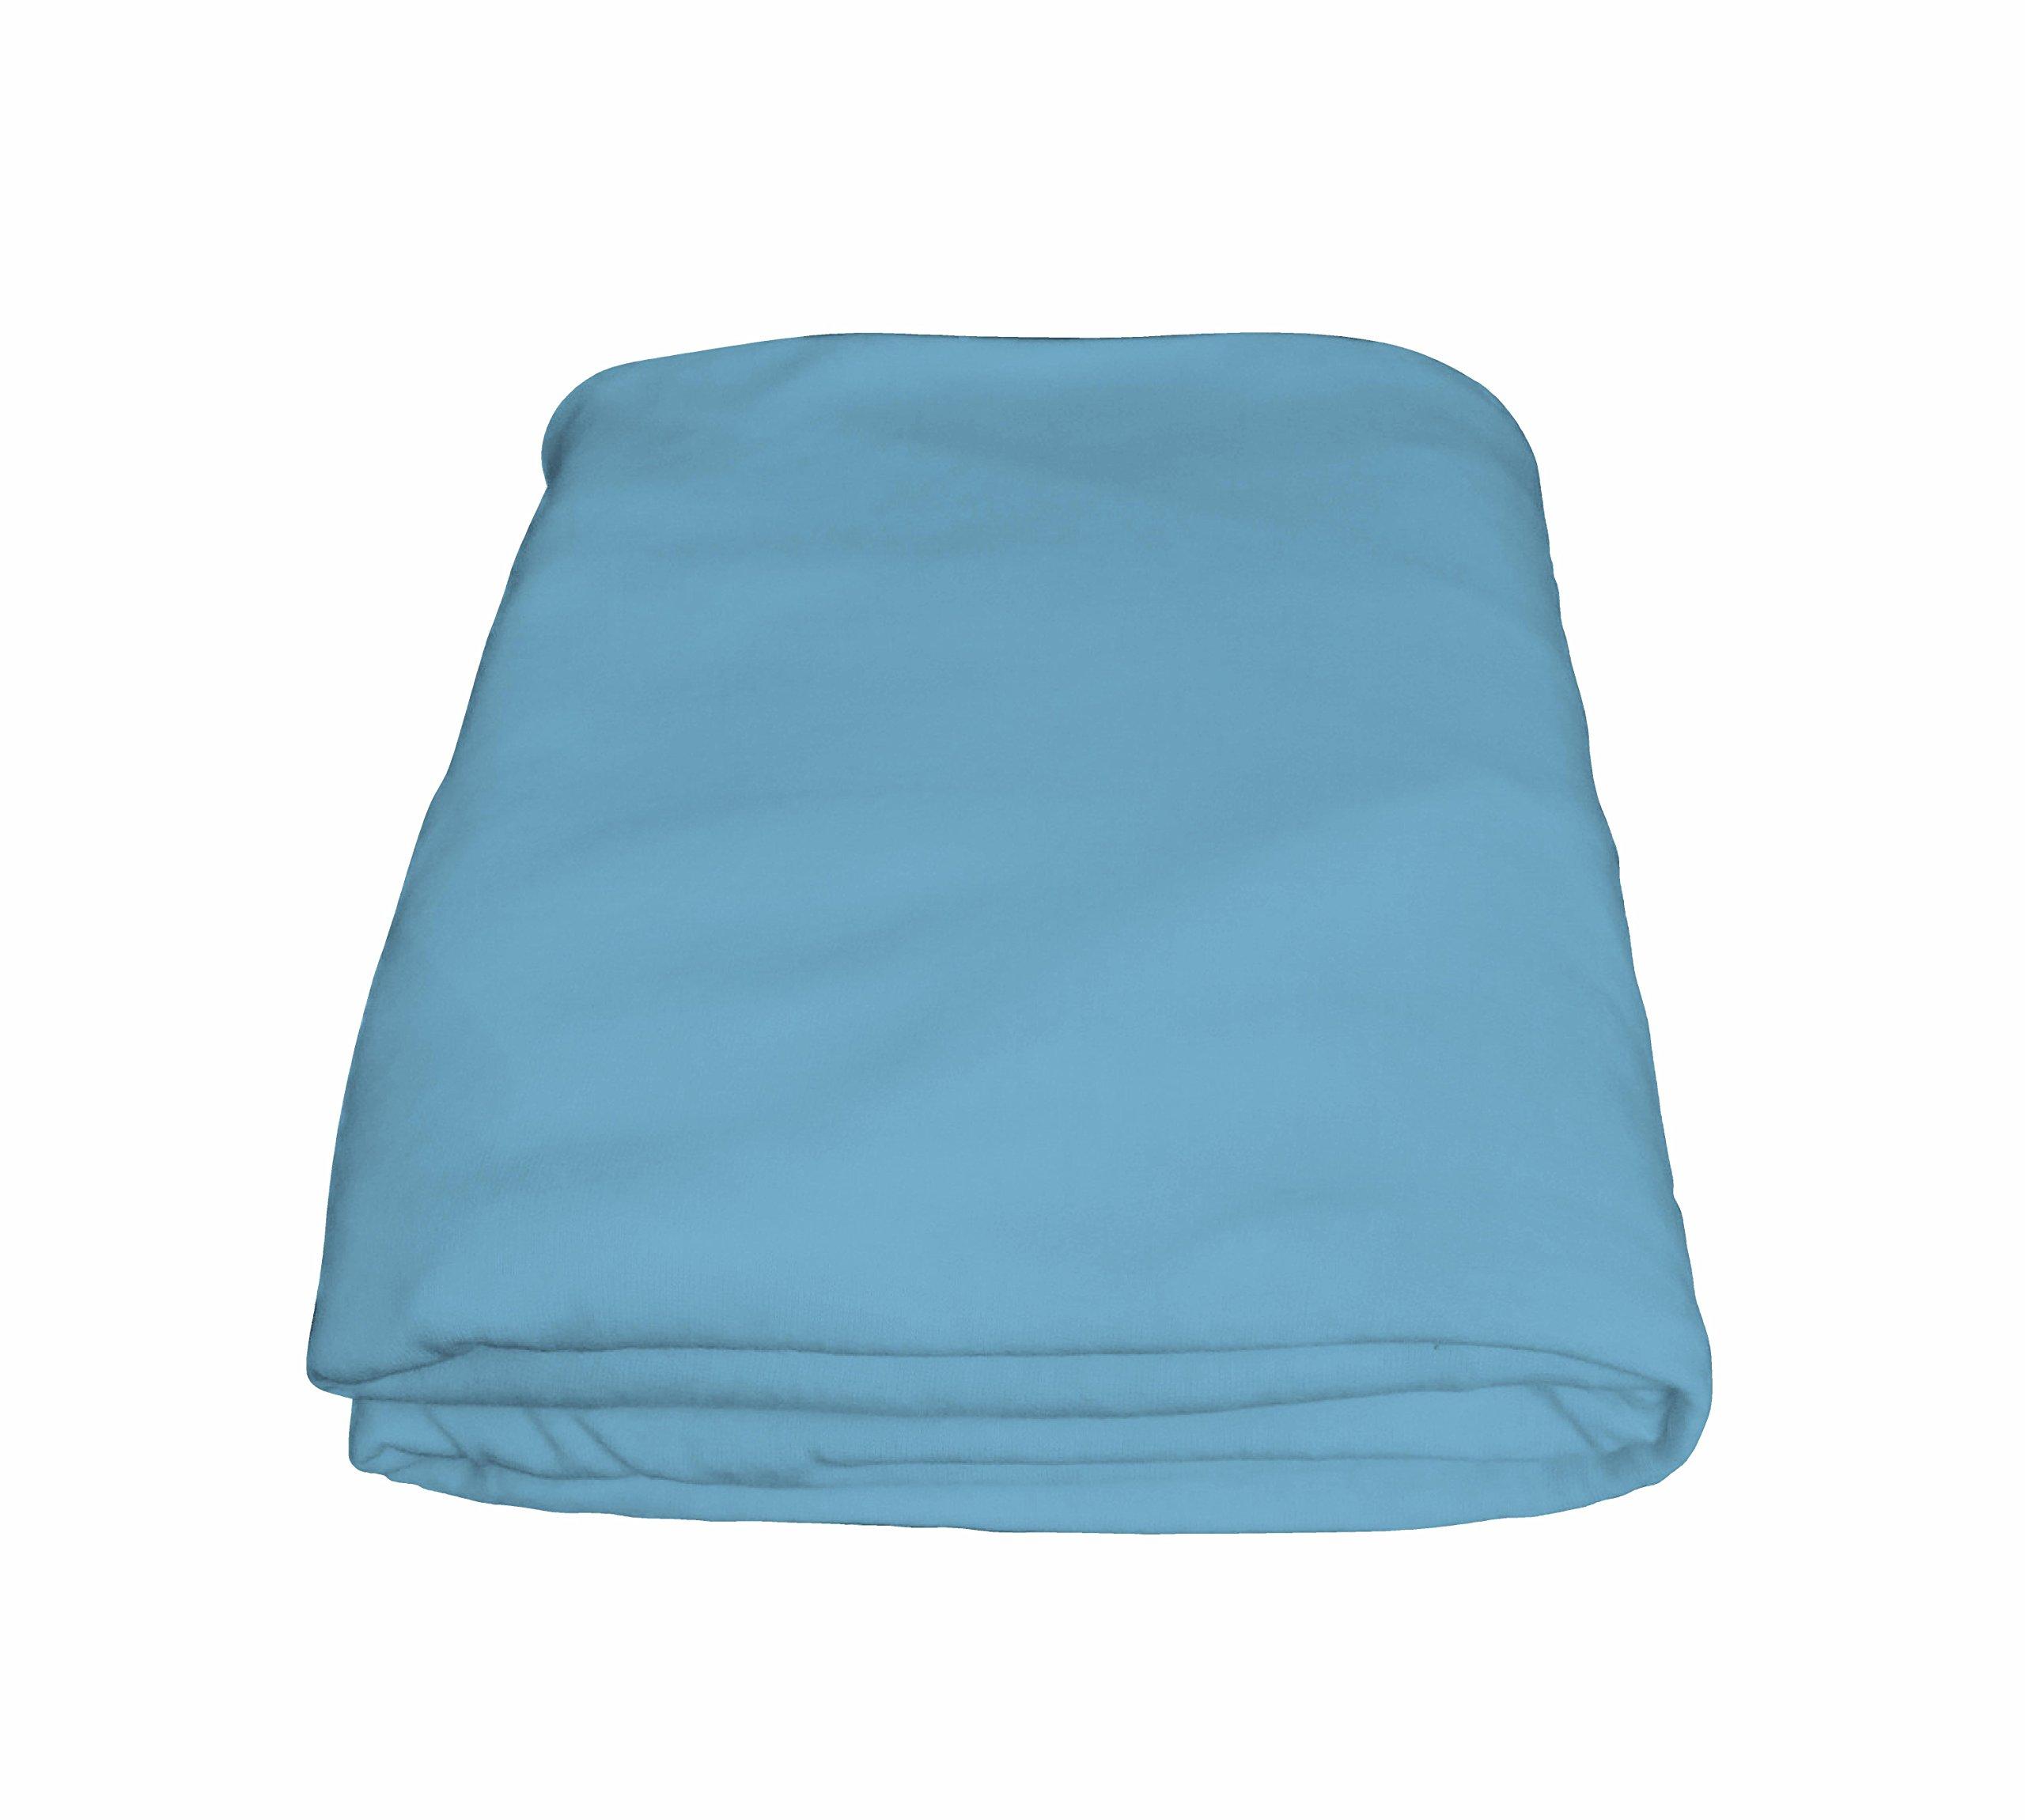 Crescent Comfy 100% Cotton Flat Hospital light blue Bed Sheets